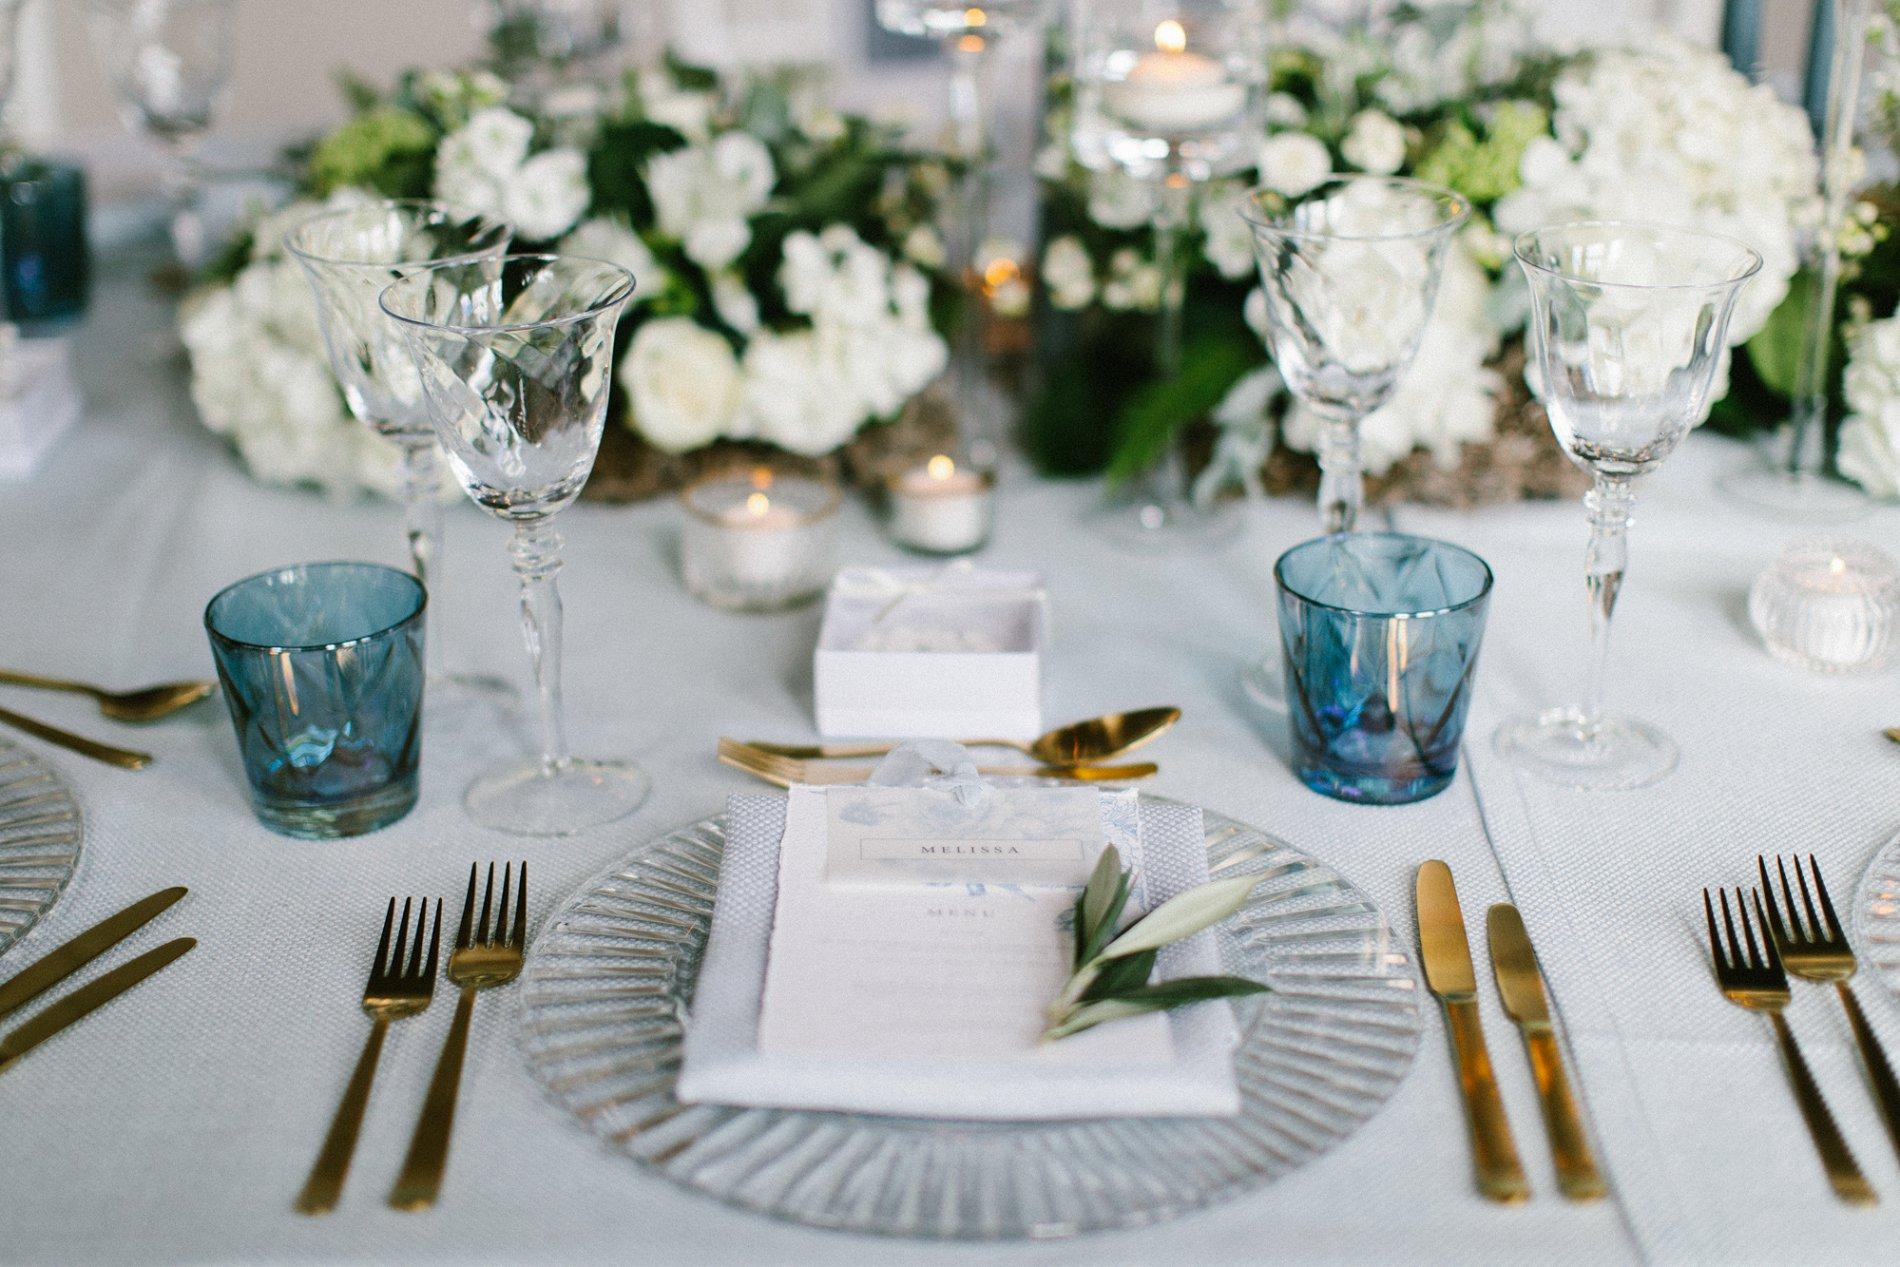 An Intimate Fine Art Wedding Shoot at Newby Hall (c) Melissa Beattie Photography (29)